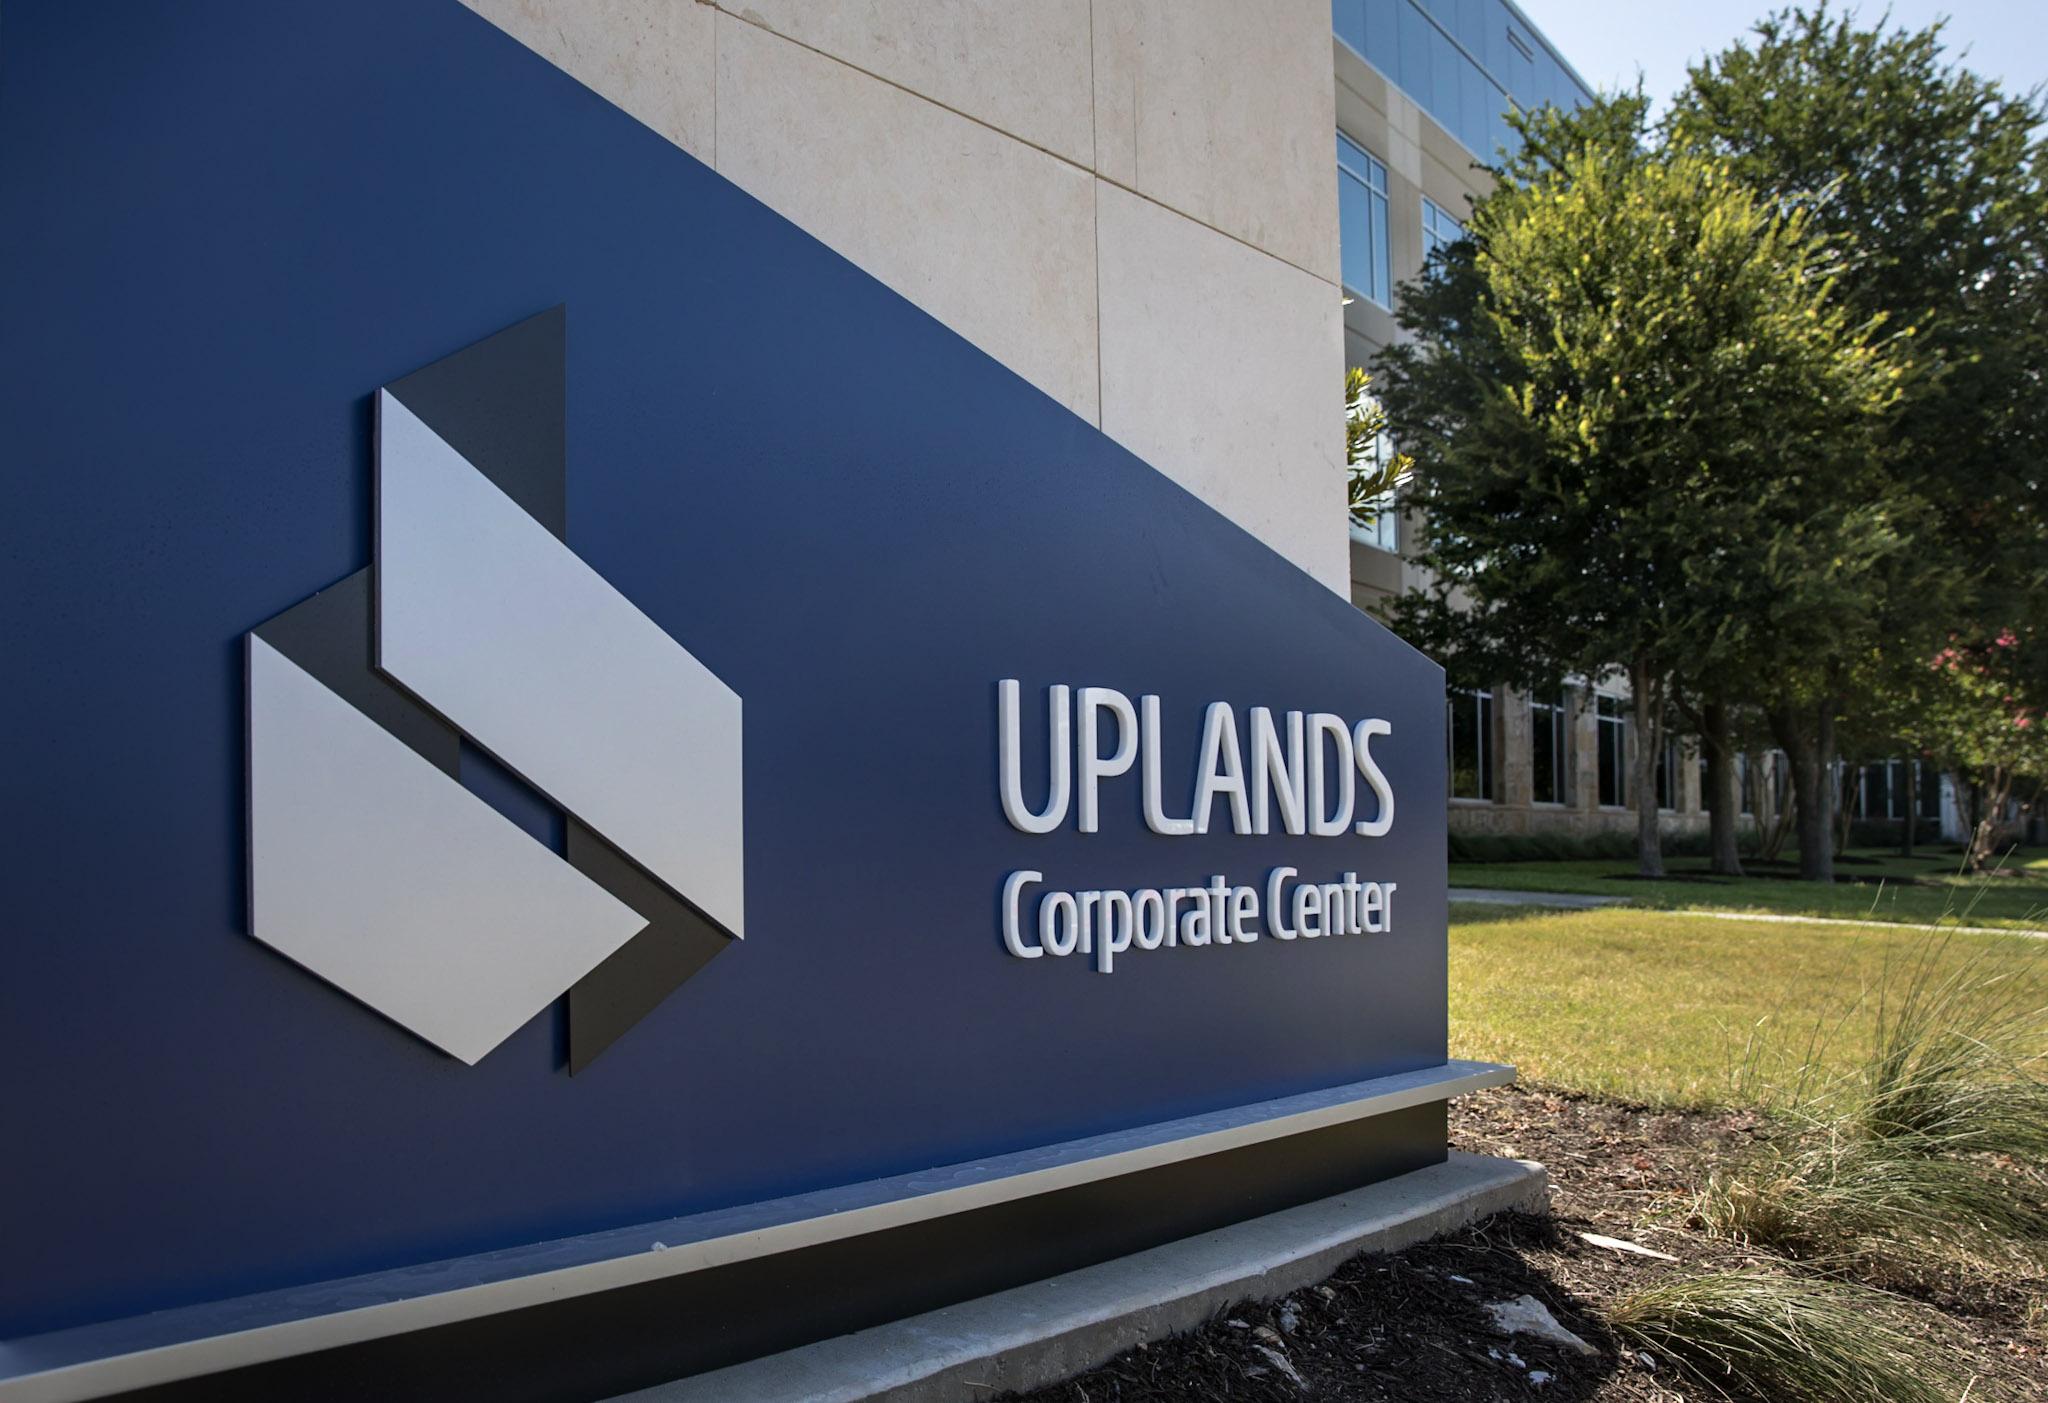 1-2017-07-20 - UplandCorporateCenter-270.jpg